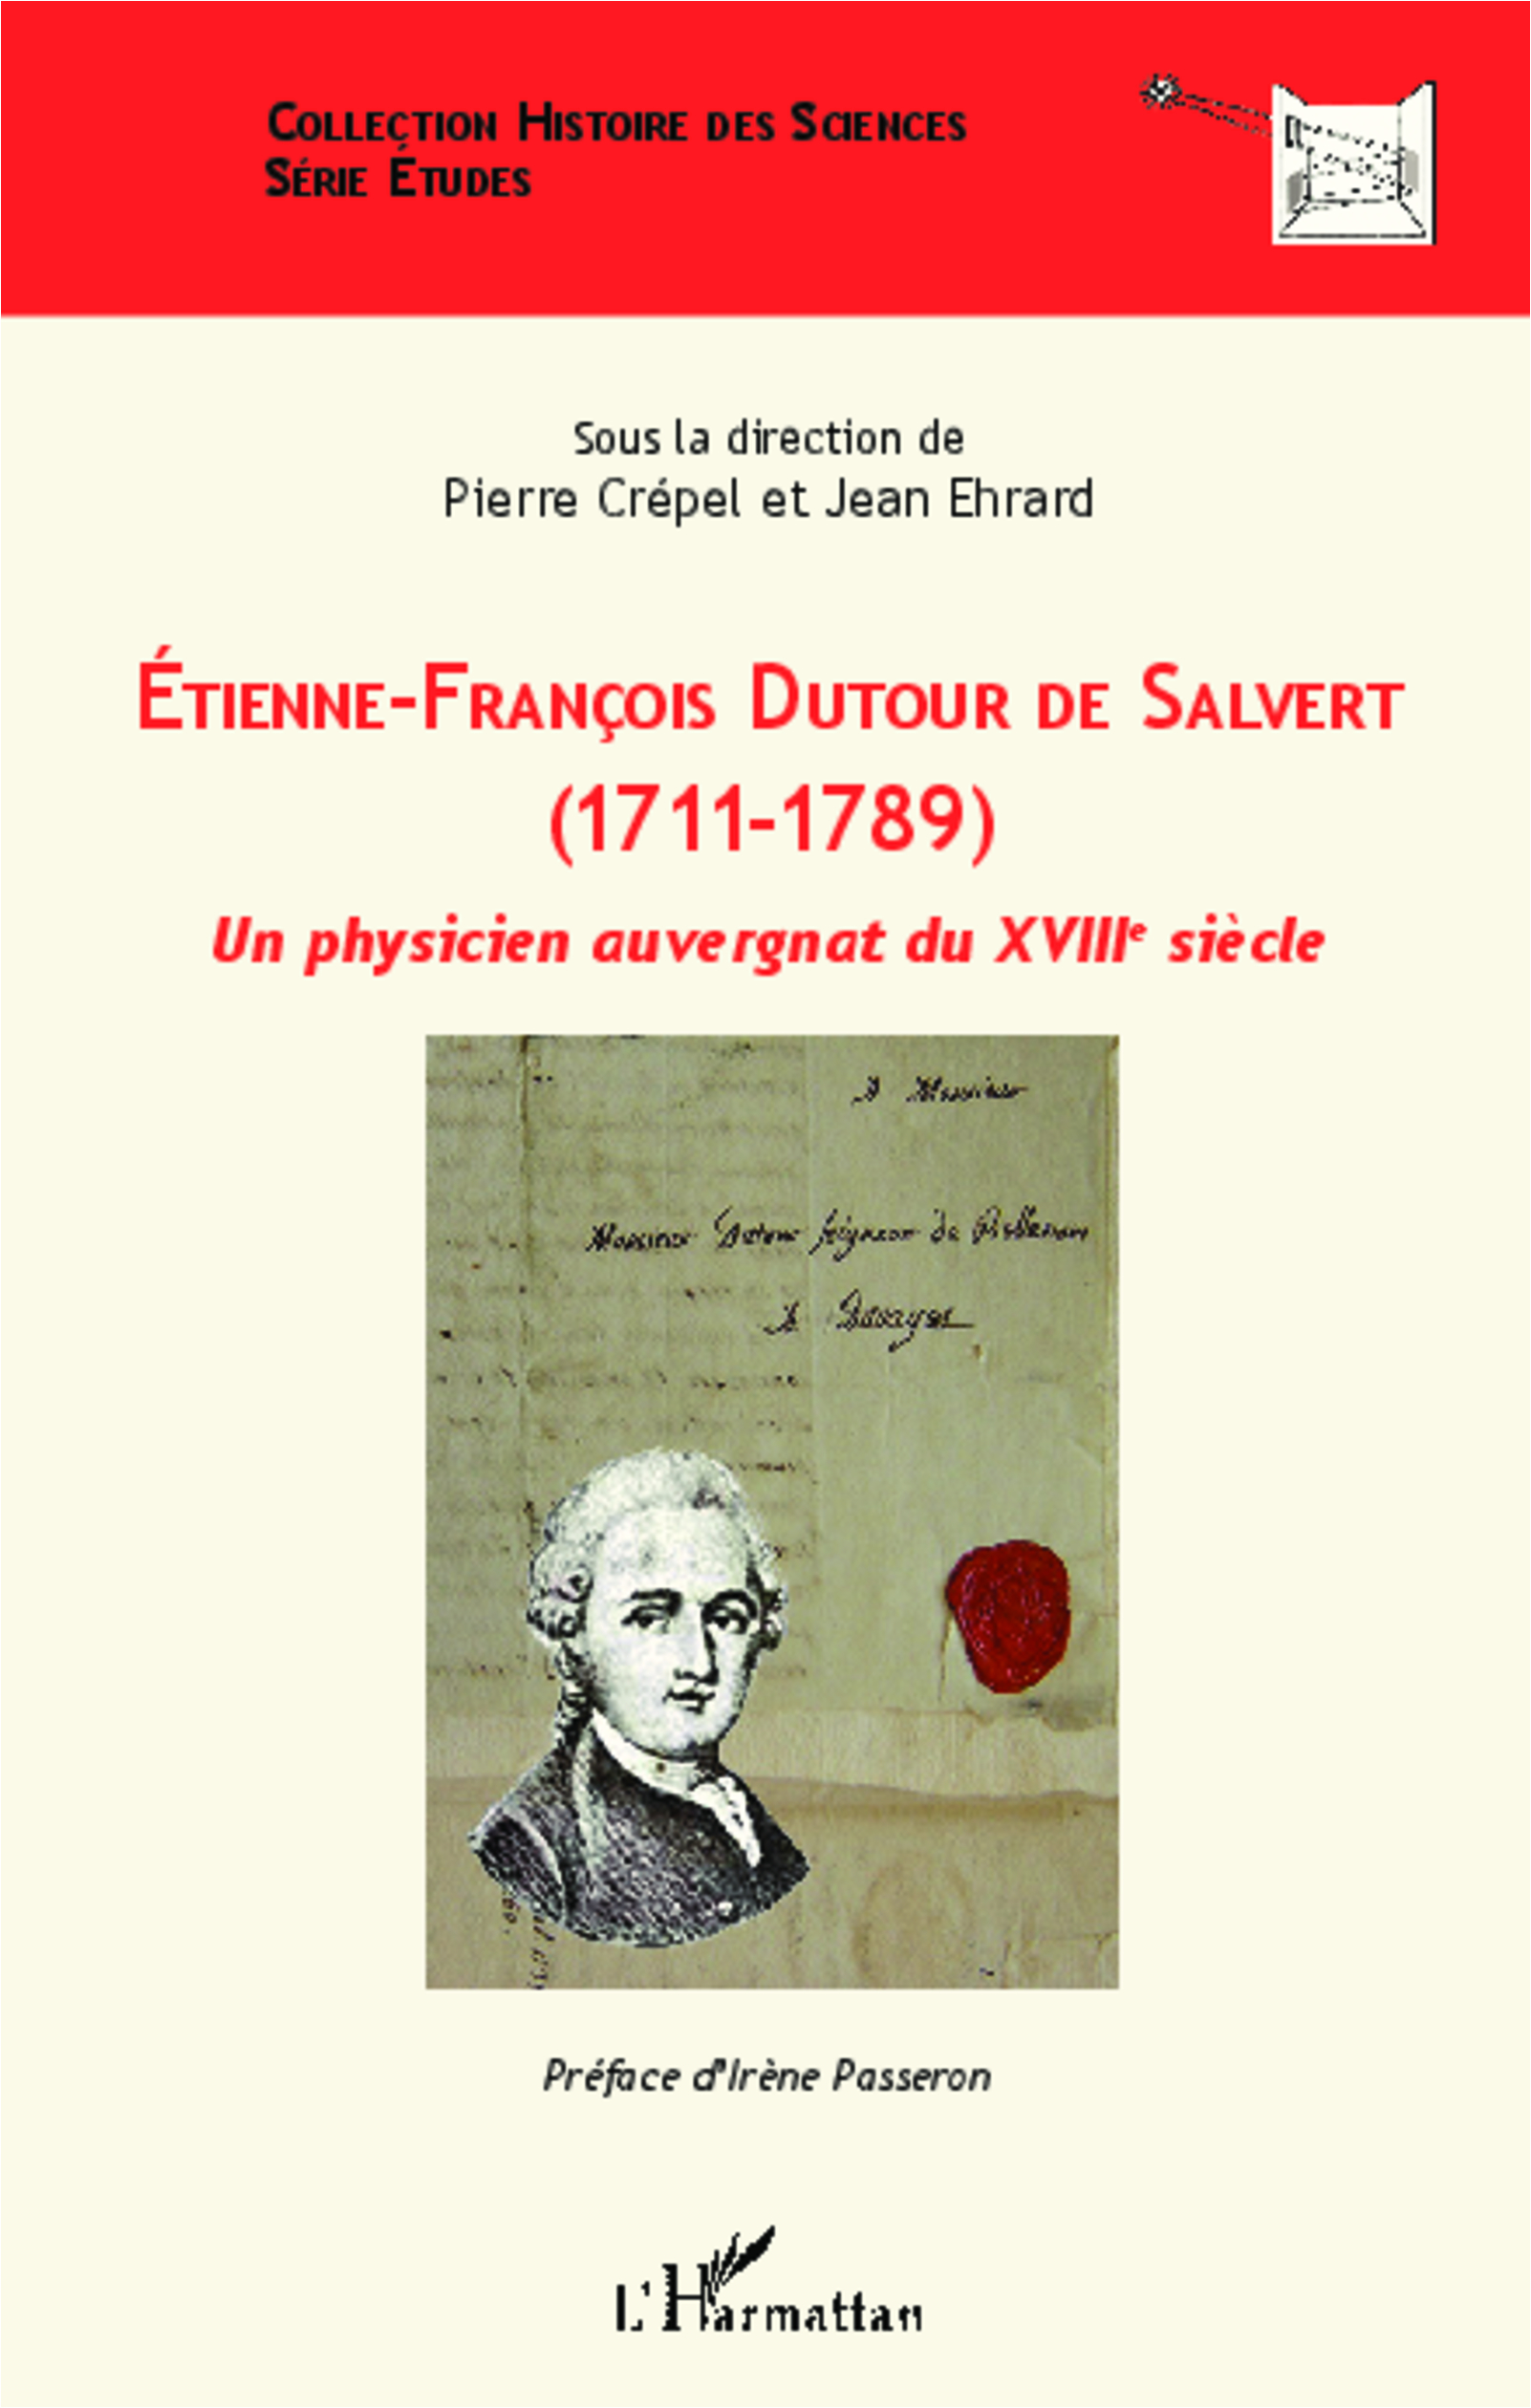 Dutour_de_Salvert_ouvrage_2014